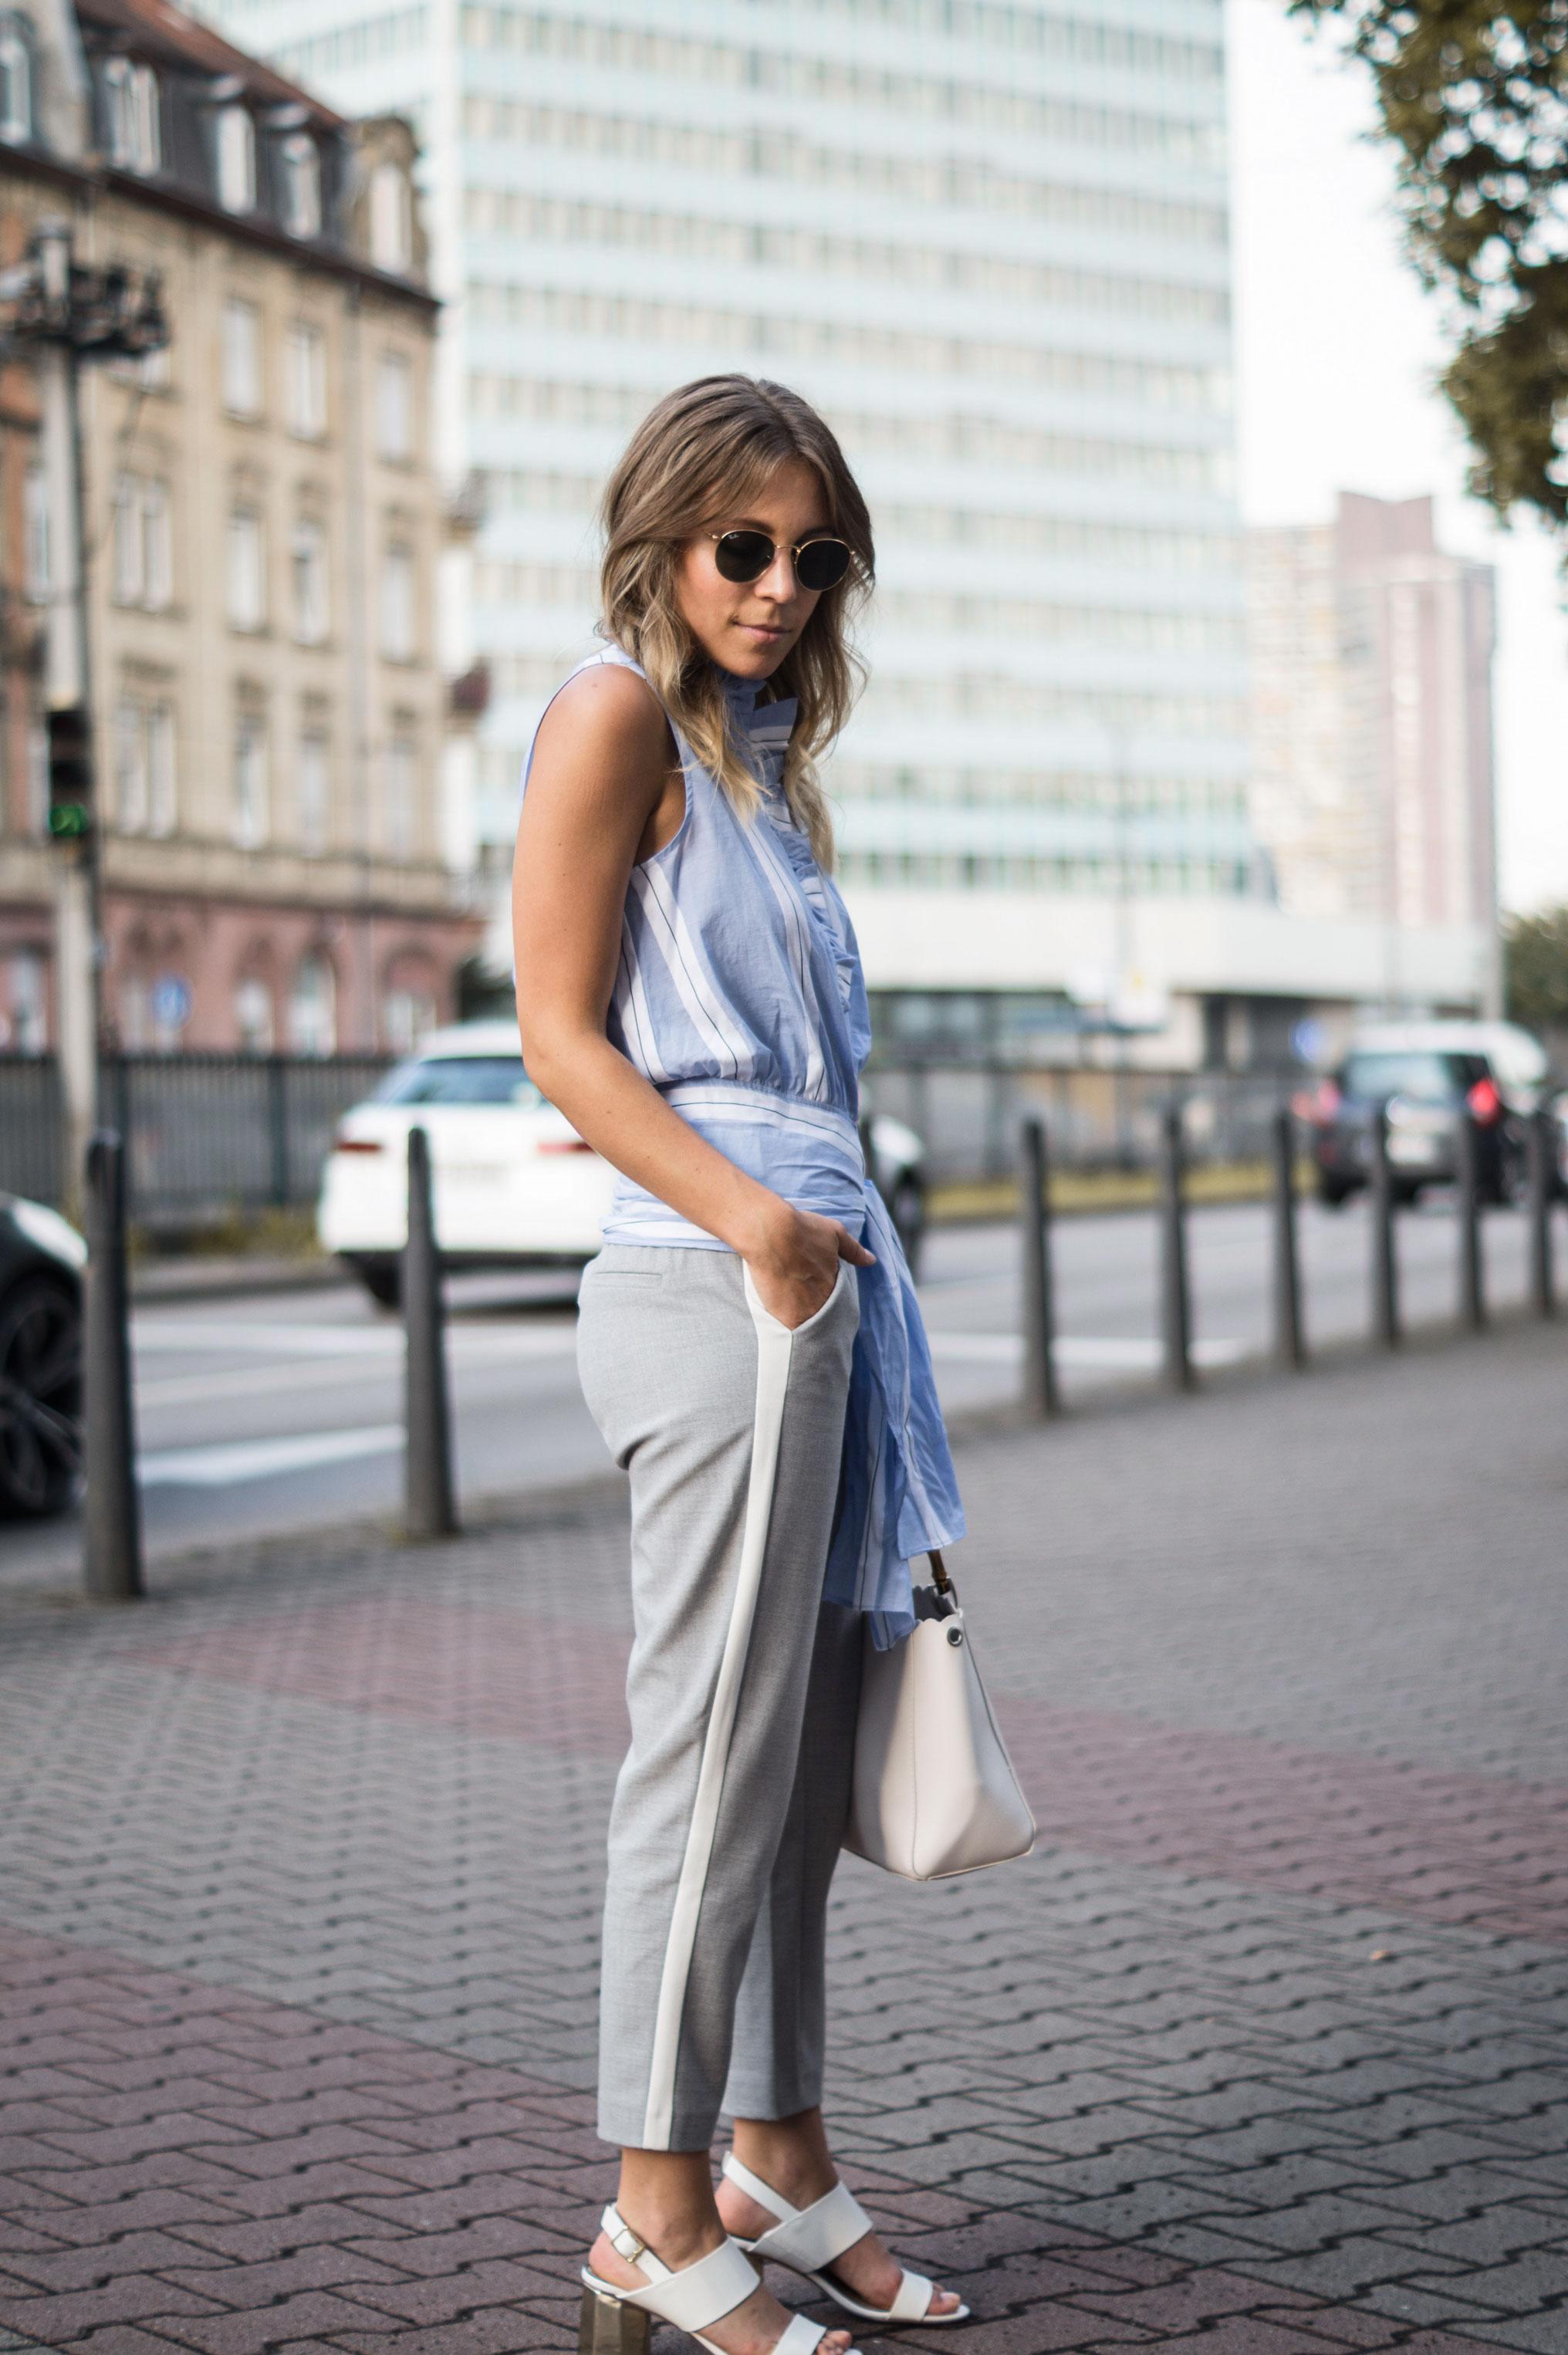 Mango-Wrap-Blouse-Knotenbluse-Joggers-Sariety-Fashionblogger-Modeblog-Heidelberg-Streetstyle-8